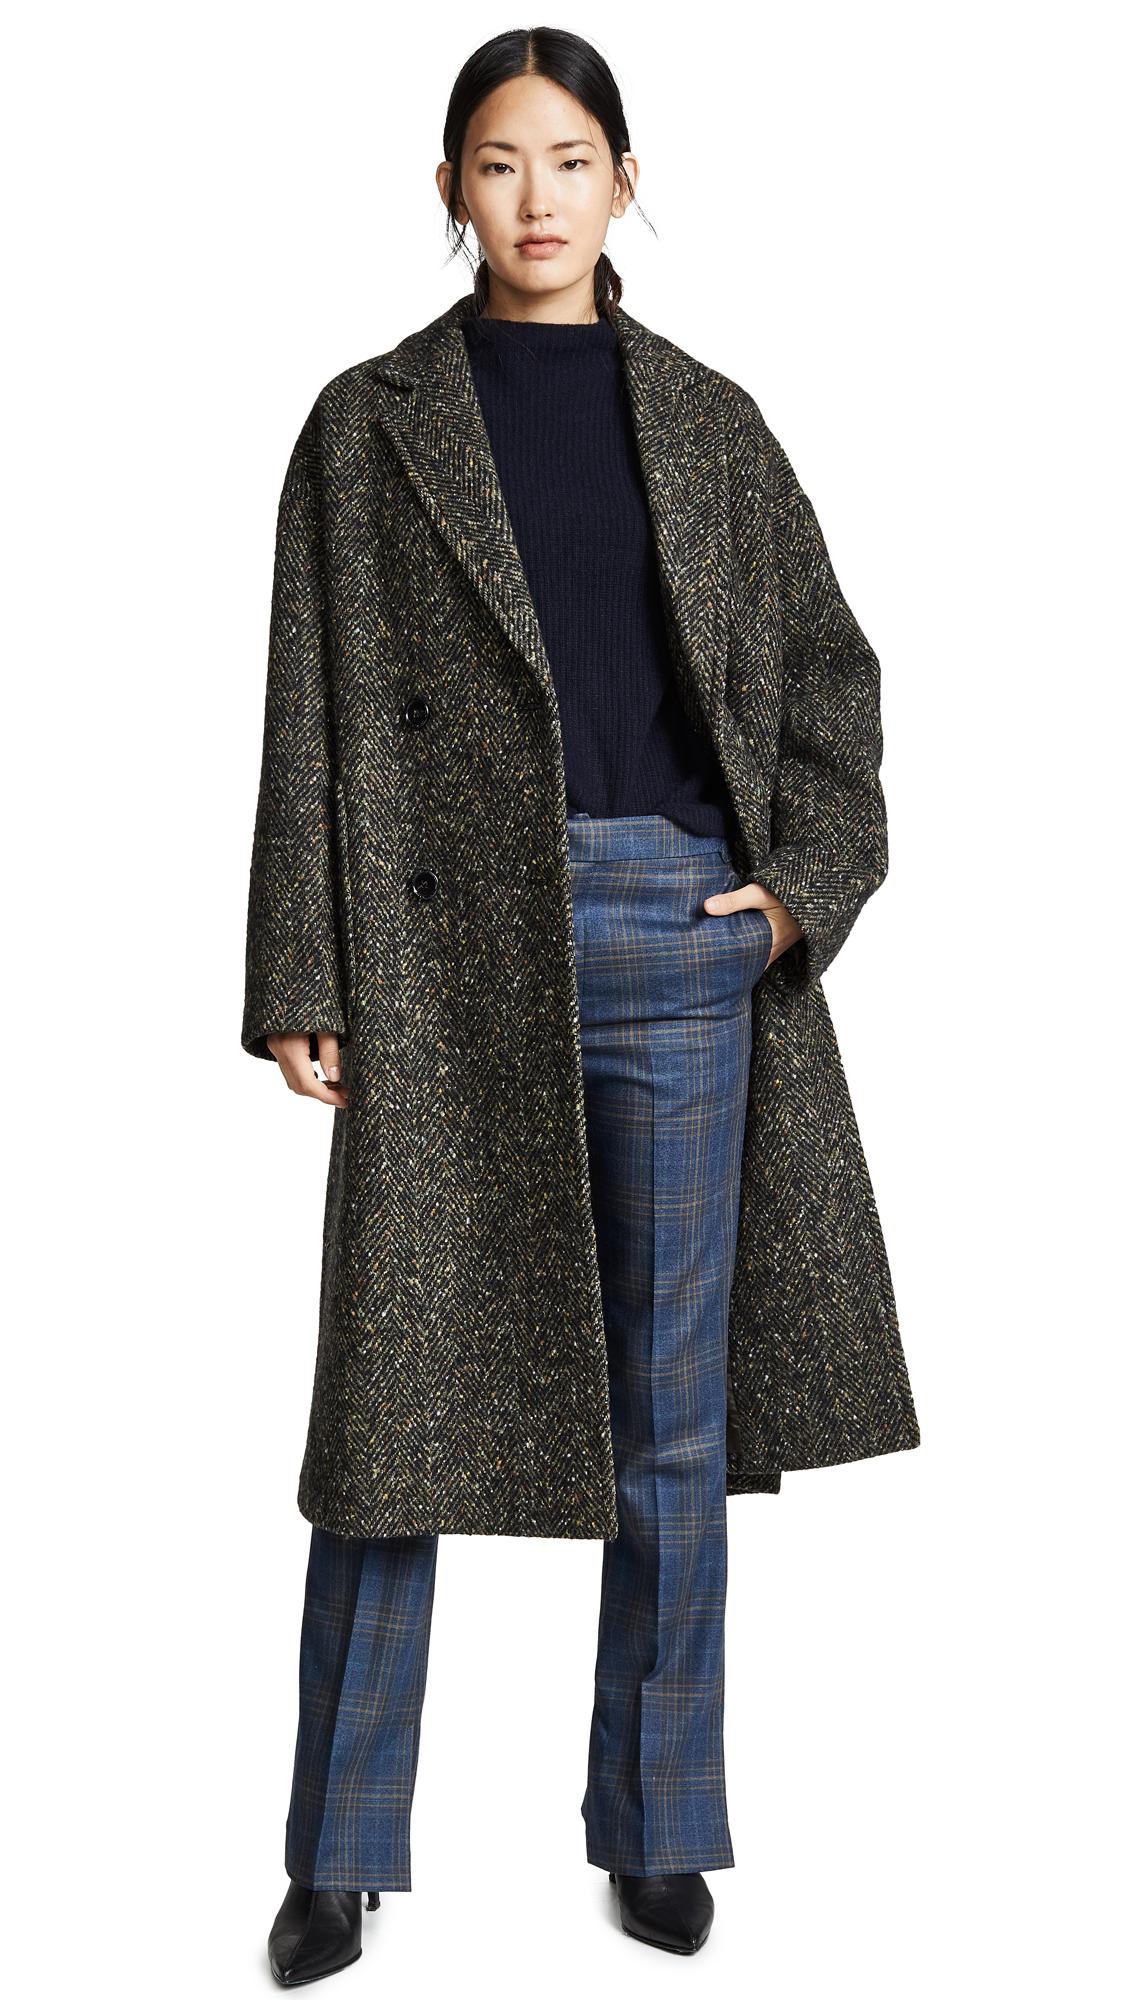 GOEN.J Oversized Wool Coat In Khaki